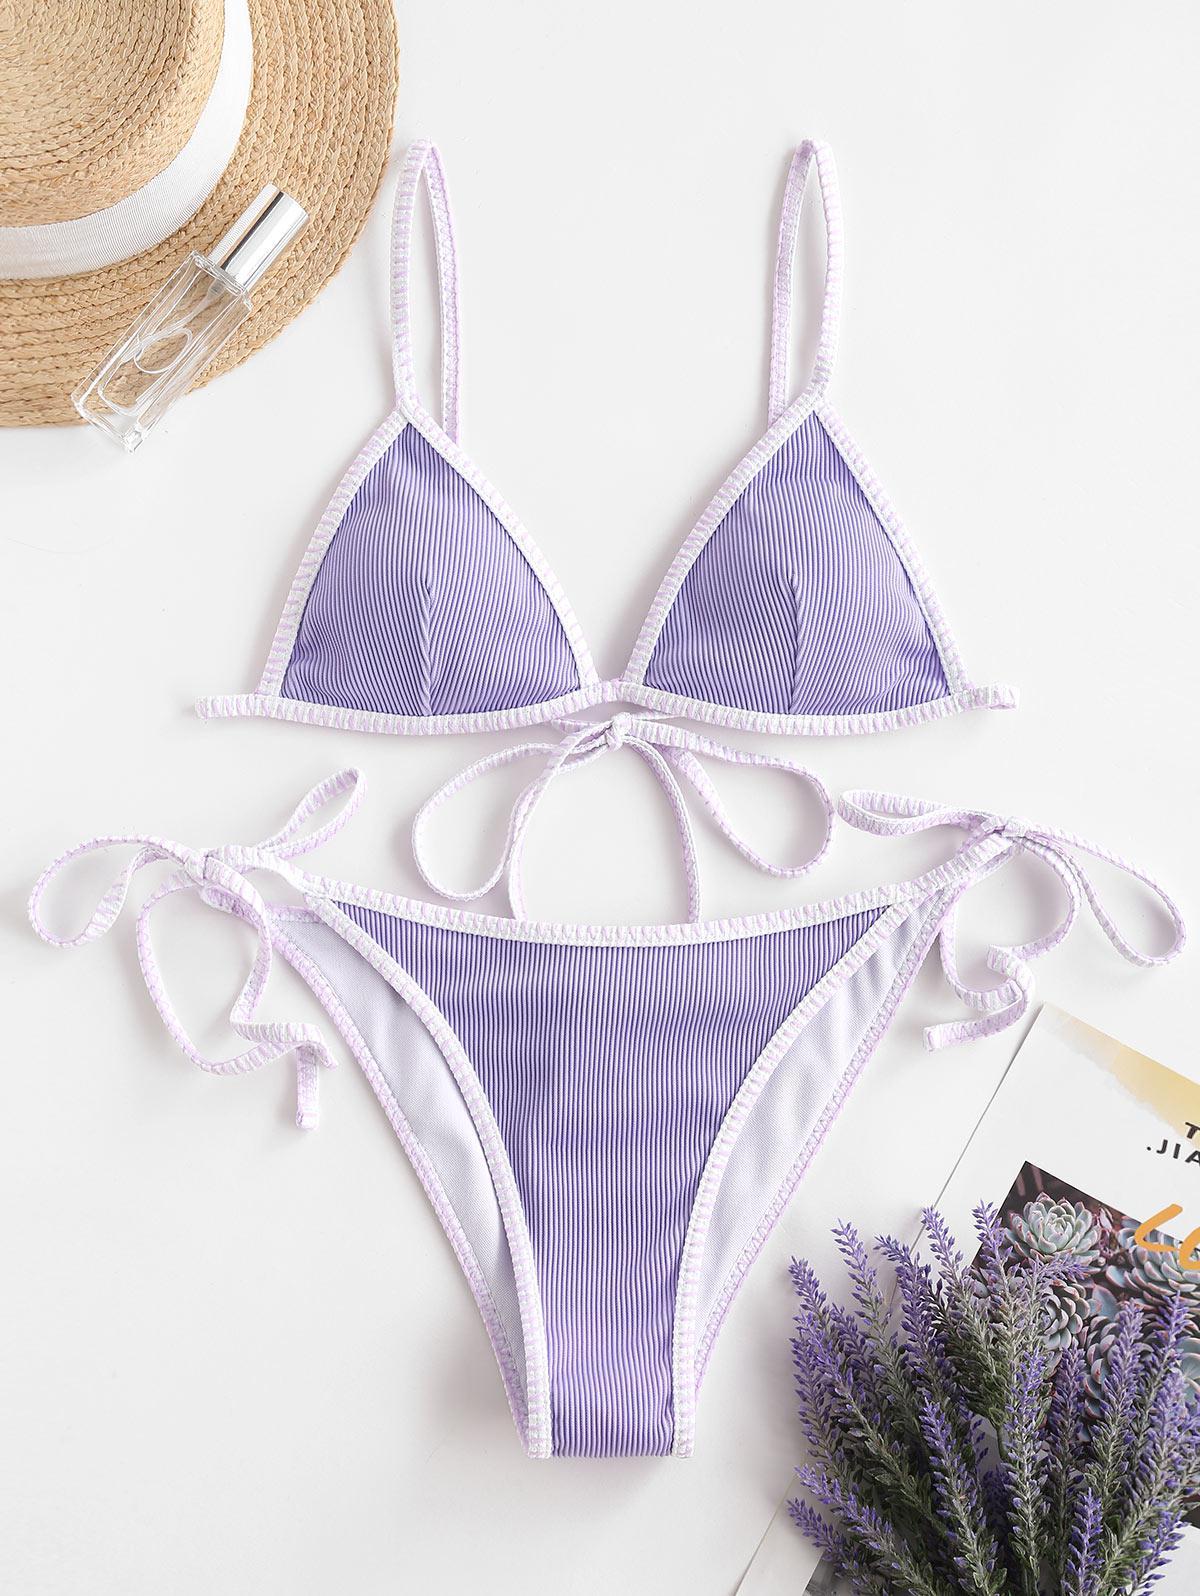 ZAFUL Whip Ribbed Tie String Bikini Swimsuit, Mauve